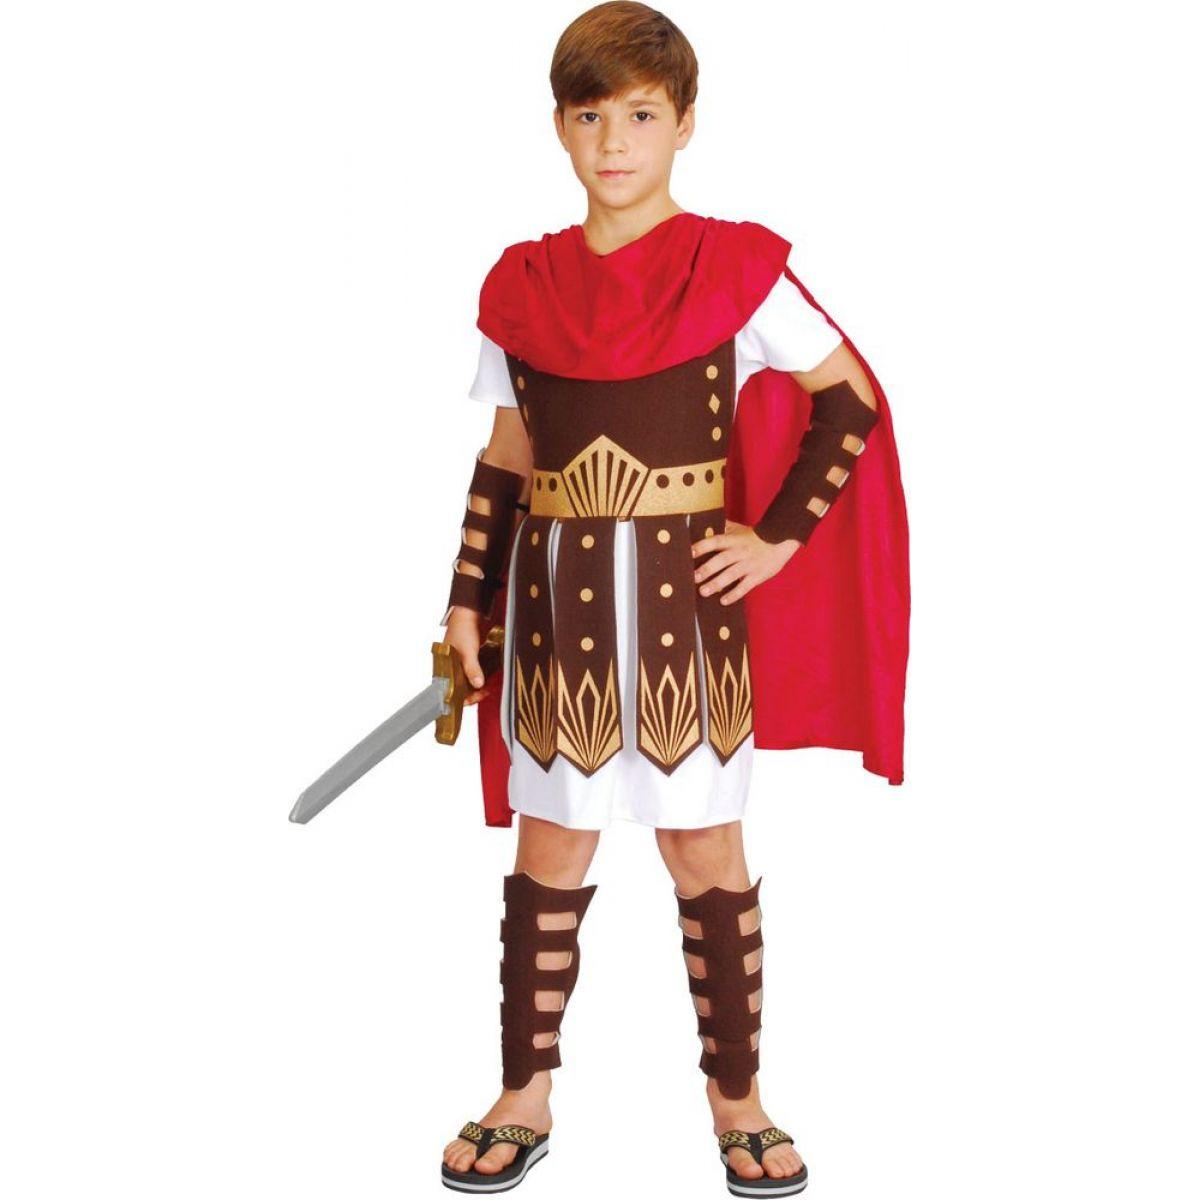 Made Dětský kostým Gladiátor 130-140 cm